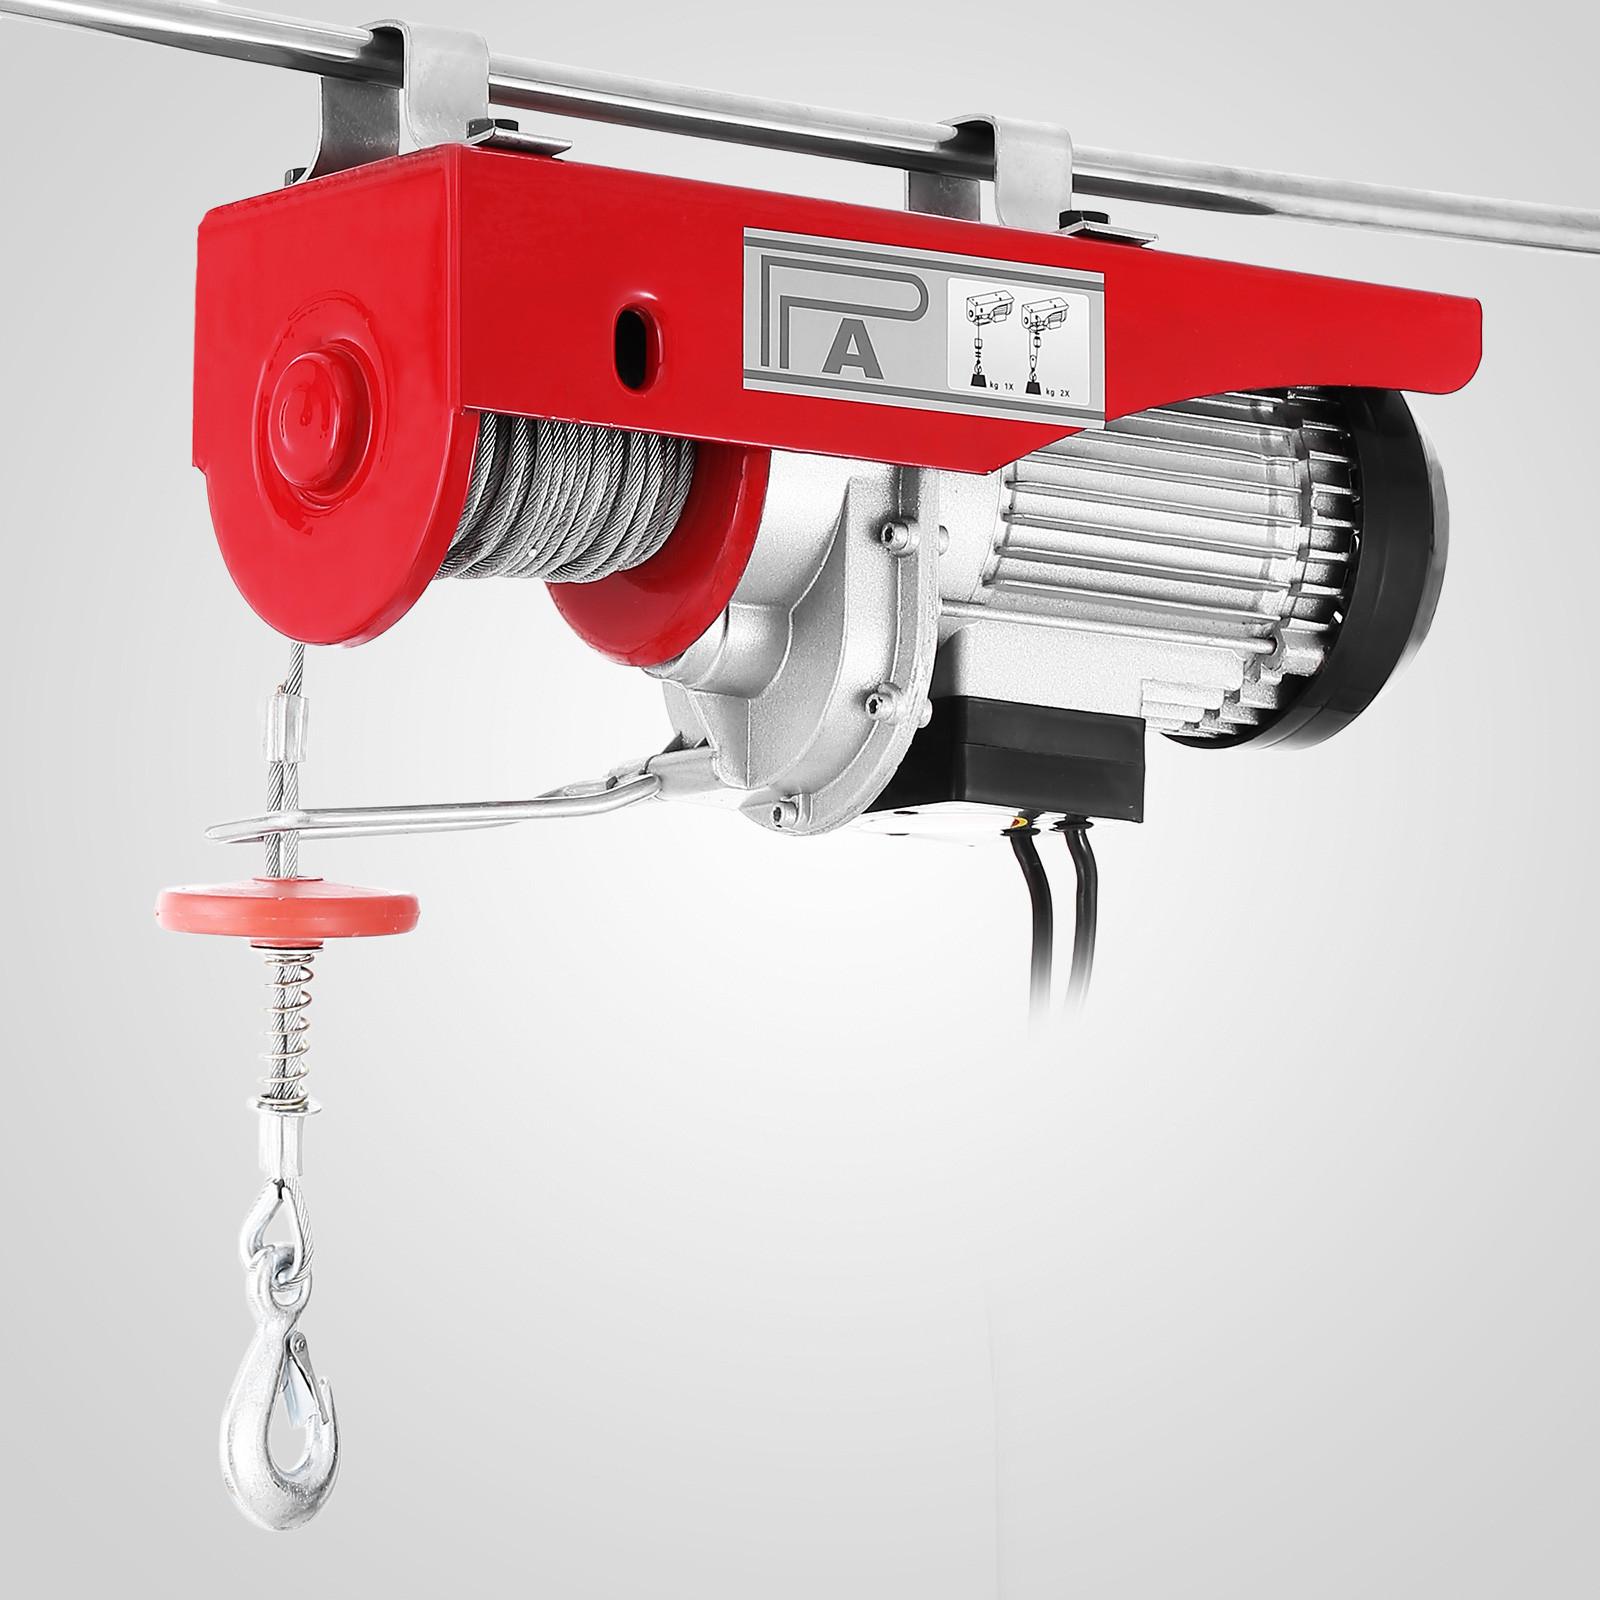 100kg-900kg-Electric-Hoist-Winch-Lifting-Engine-Crane-Cable-Lift-Hook-Garage miniature 54